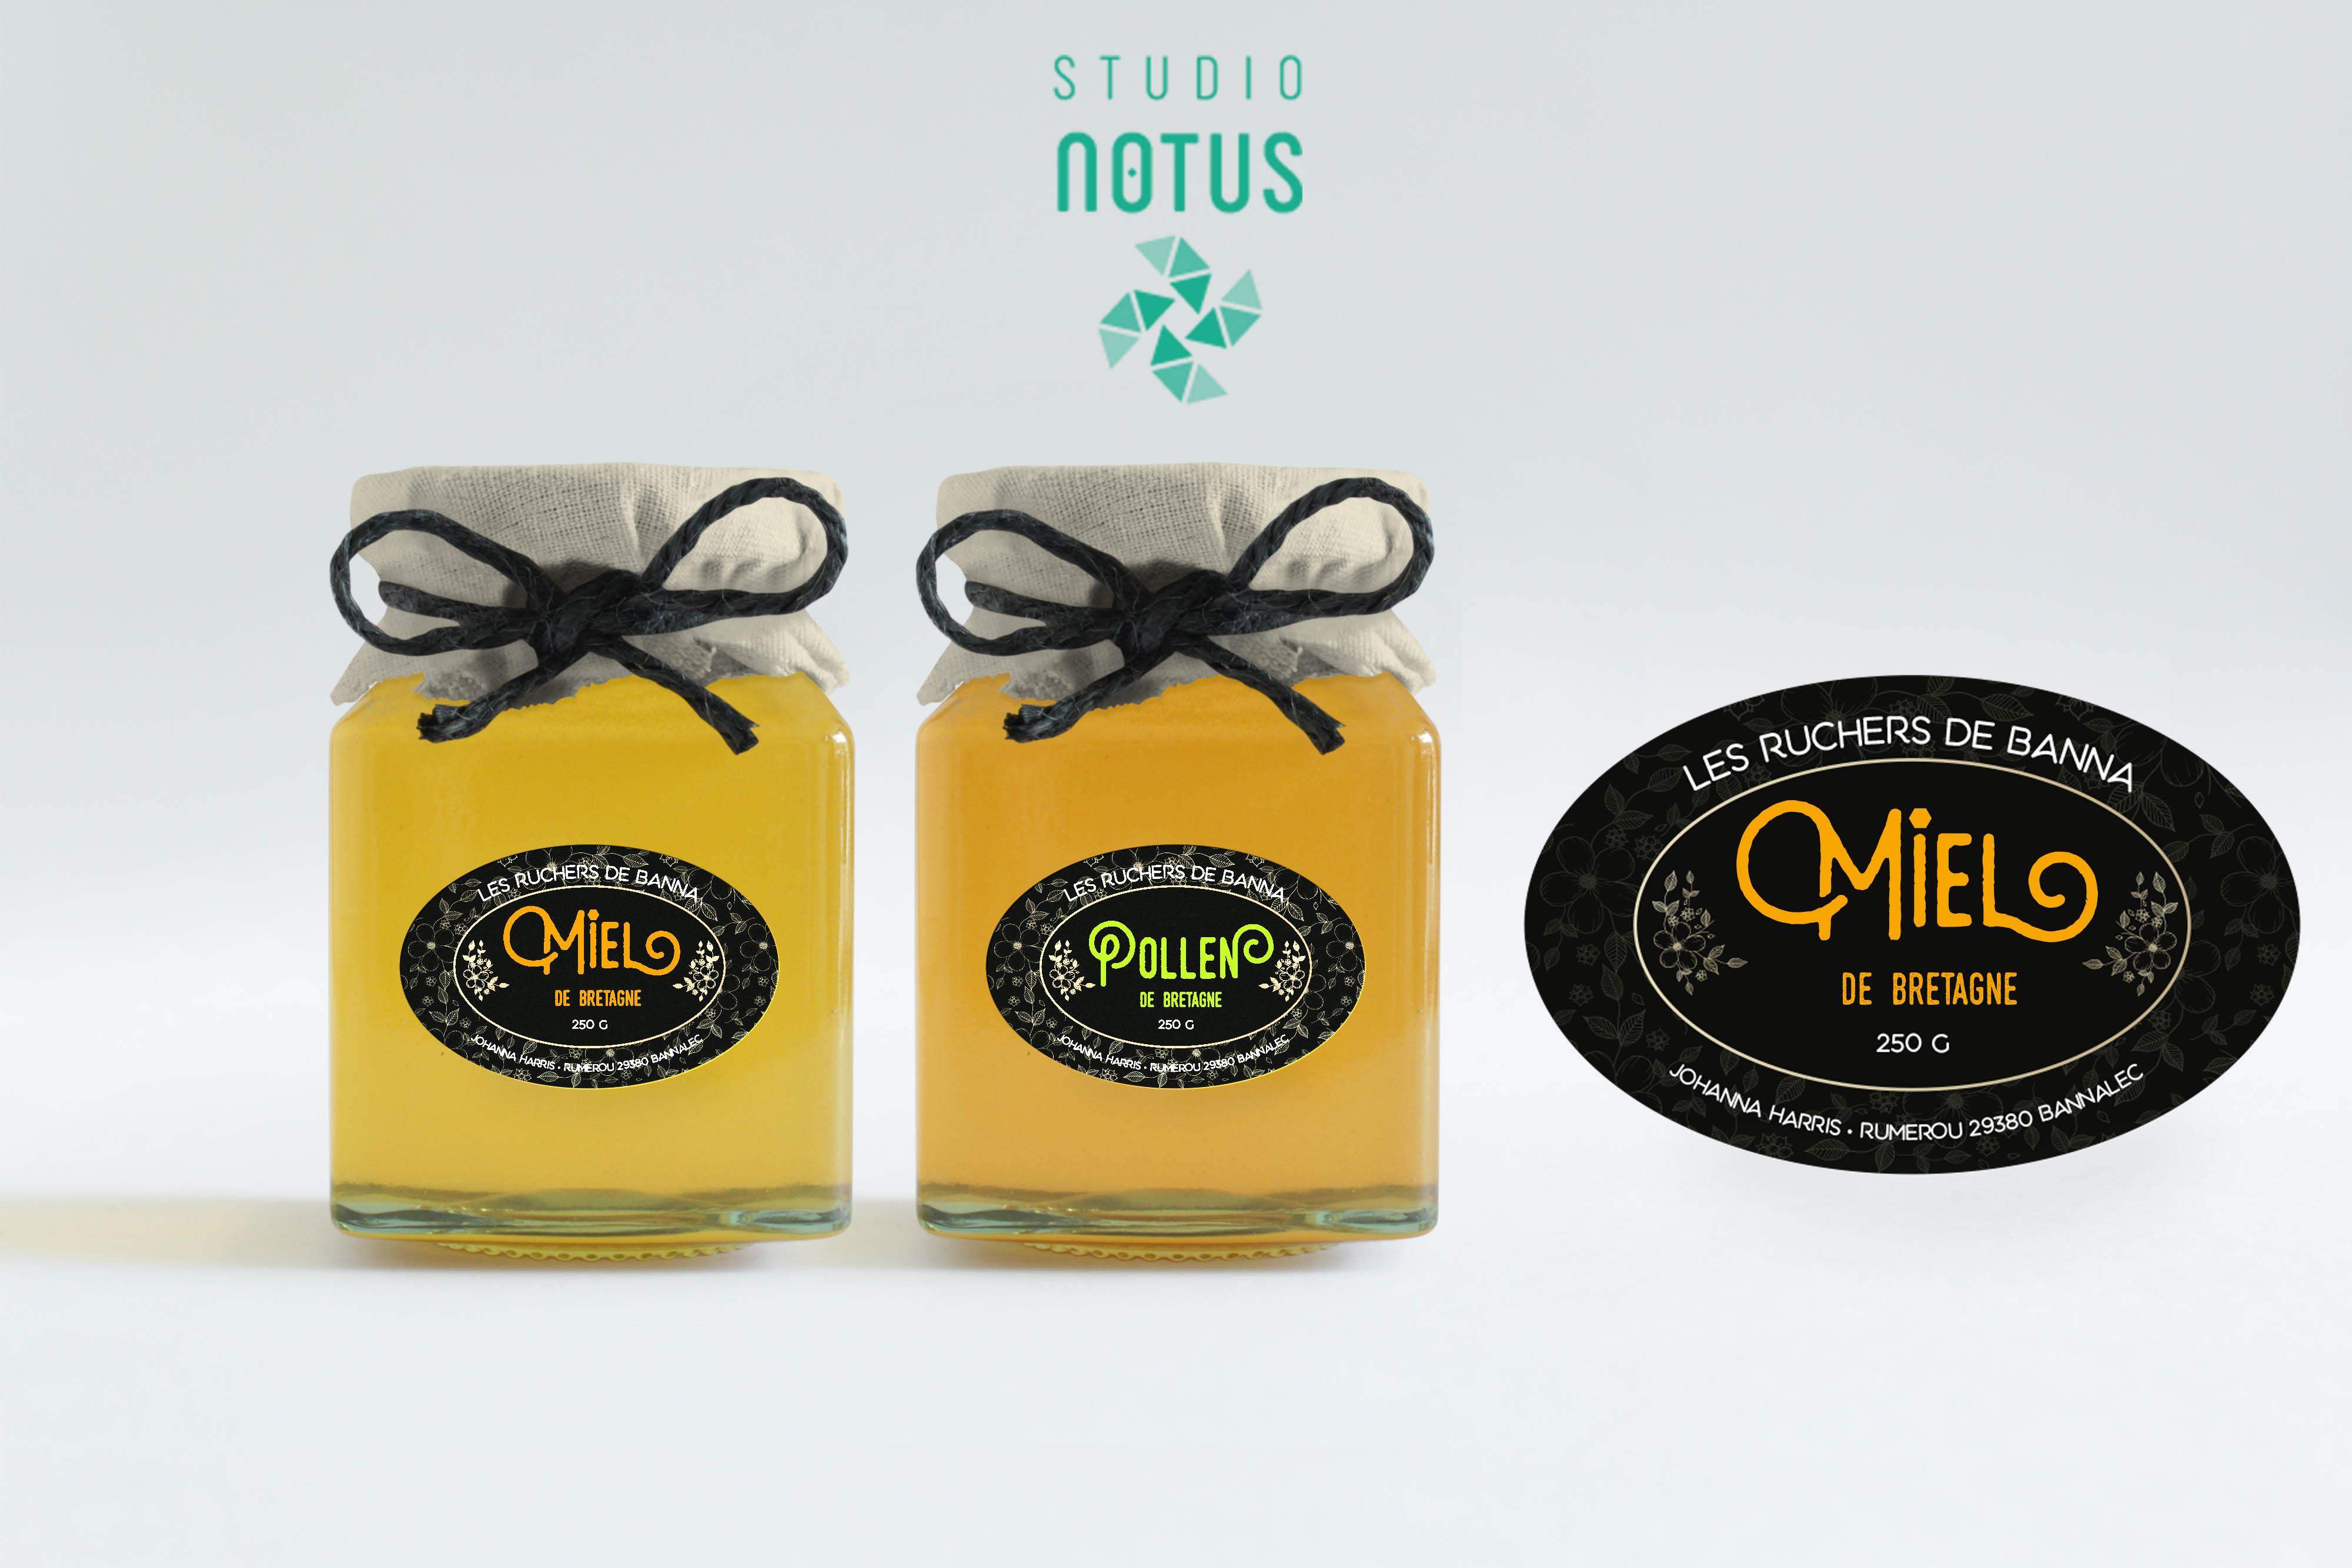 Étiquettes miel